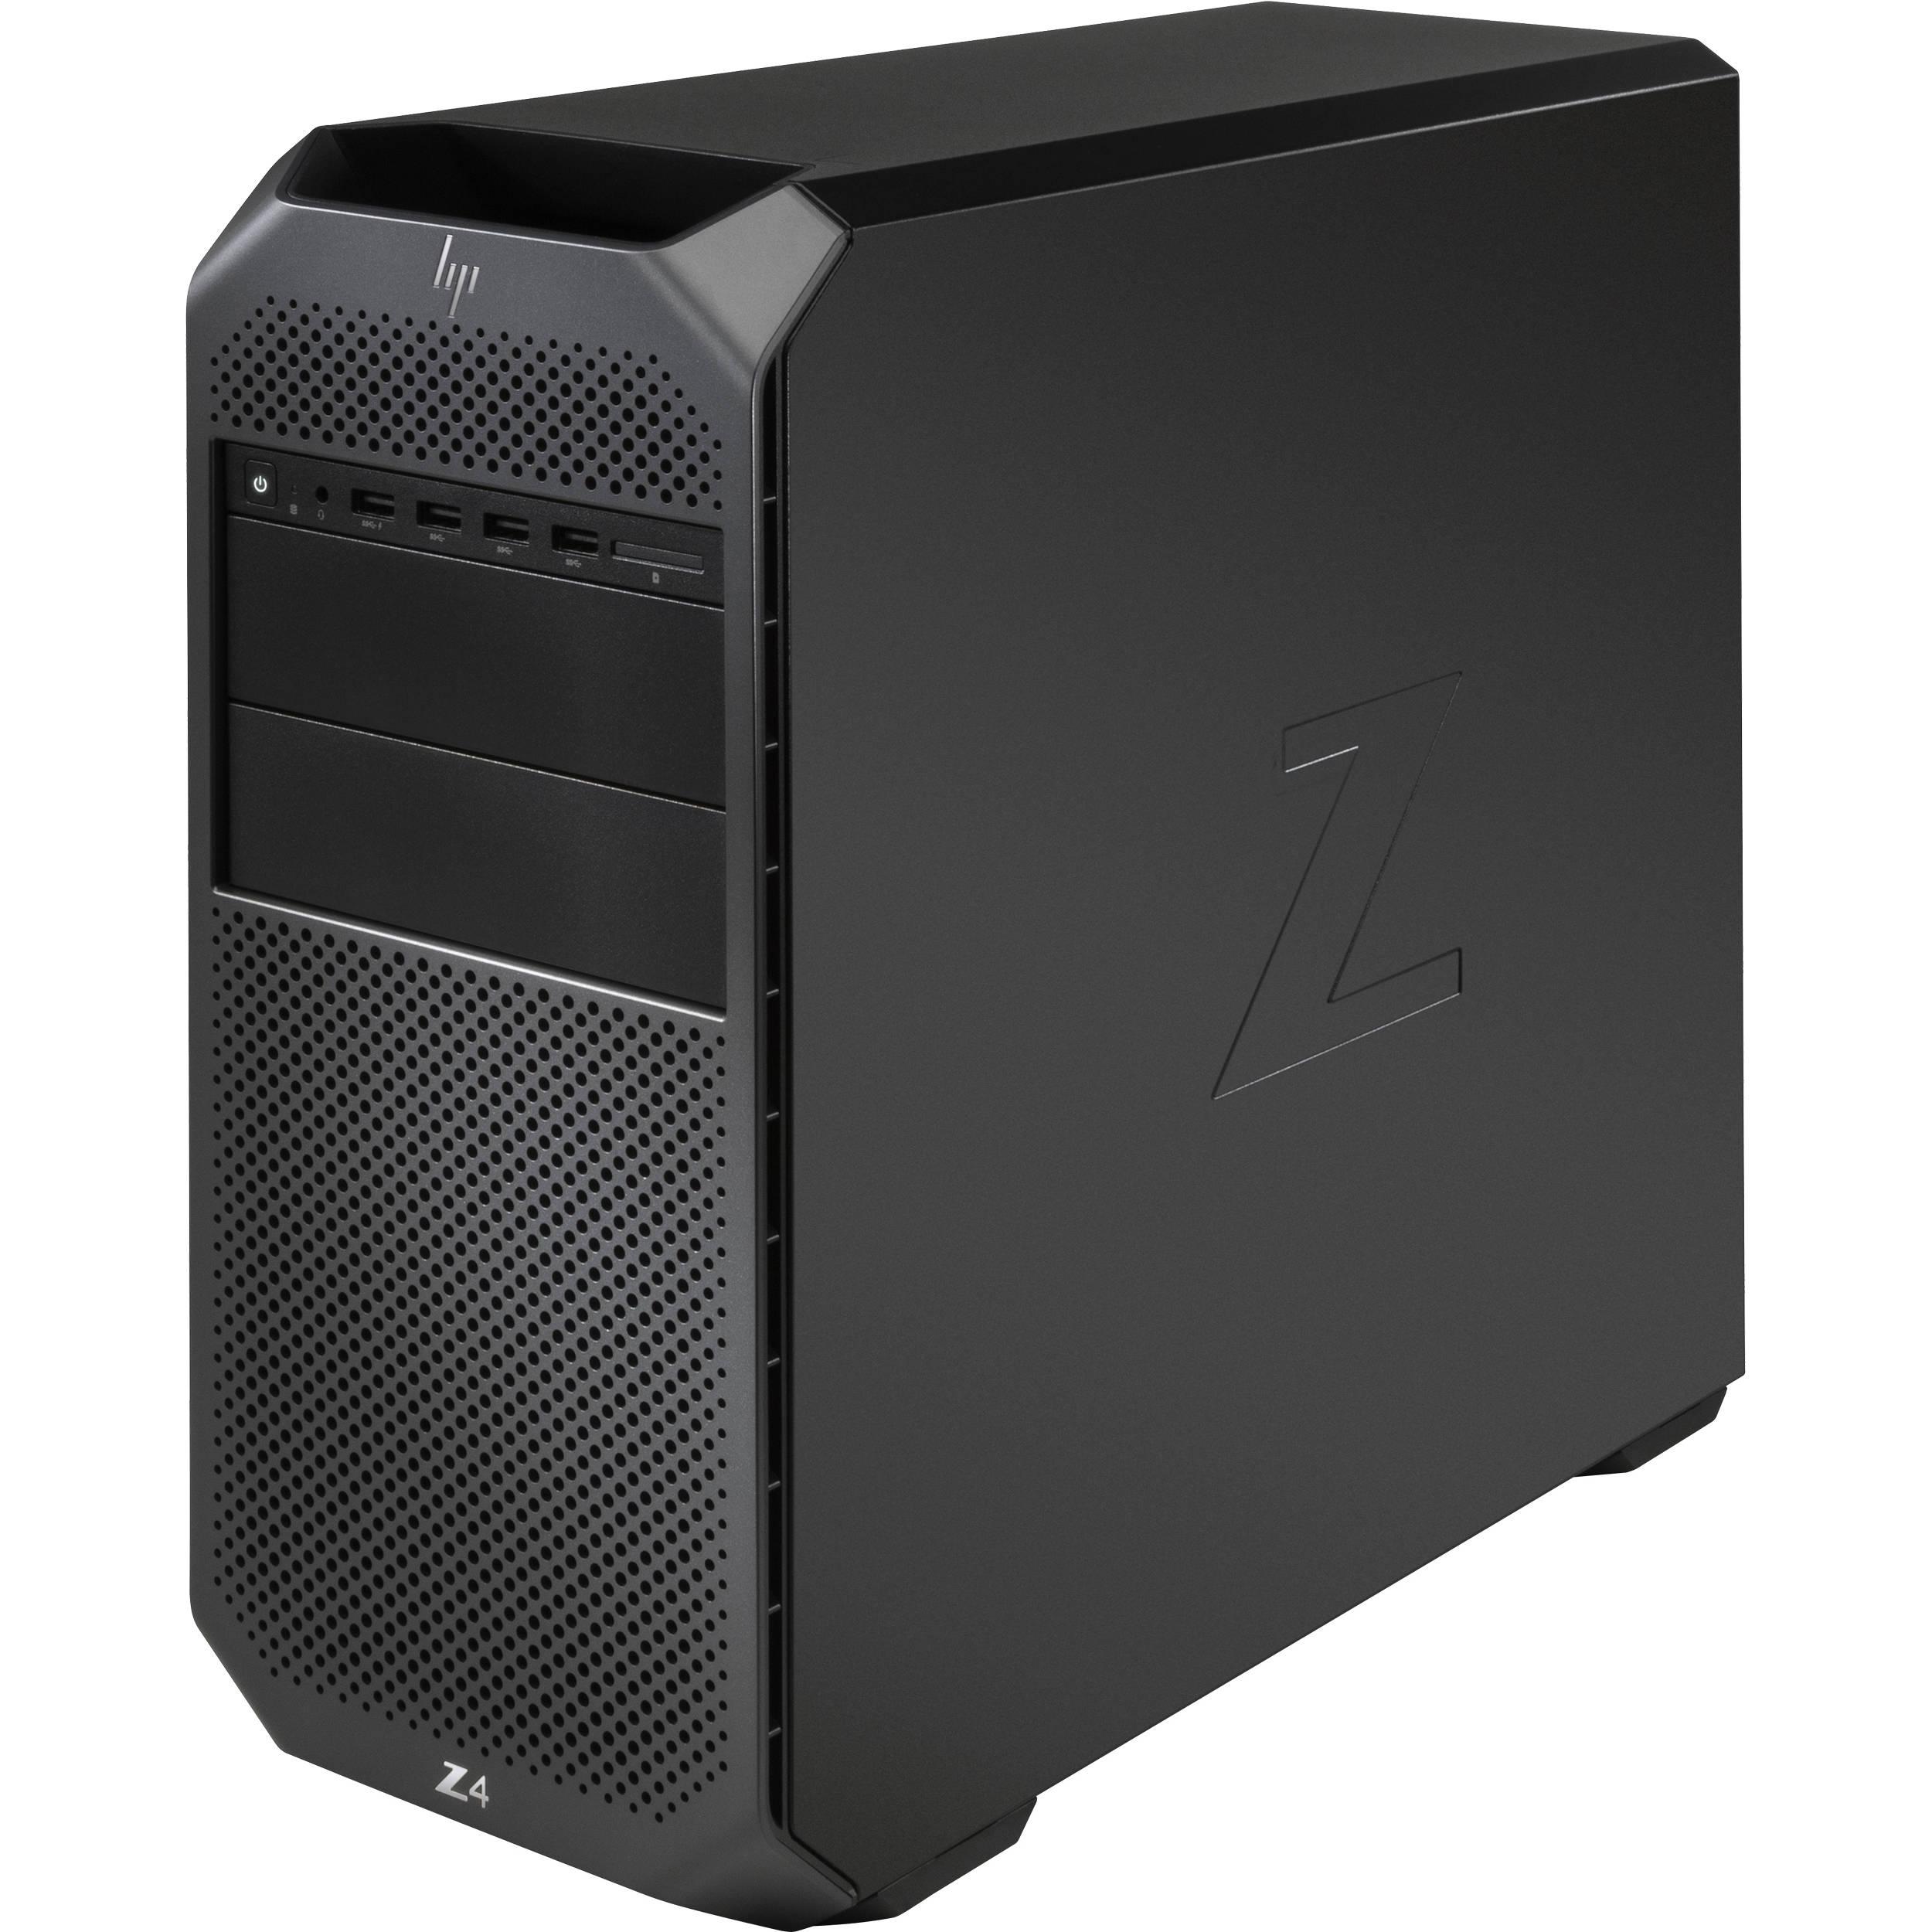 کامپیوتر دسکتاپ اچپی مدل Z4 G4 Workstation-I